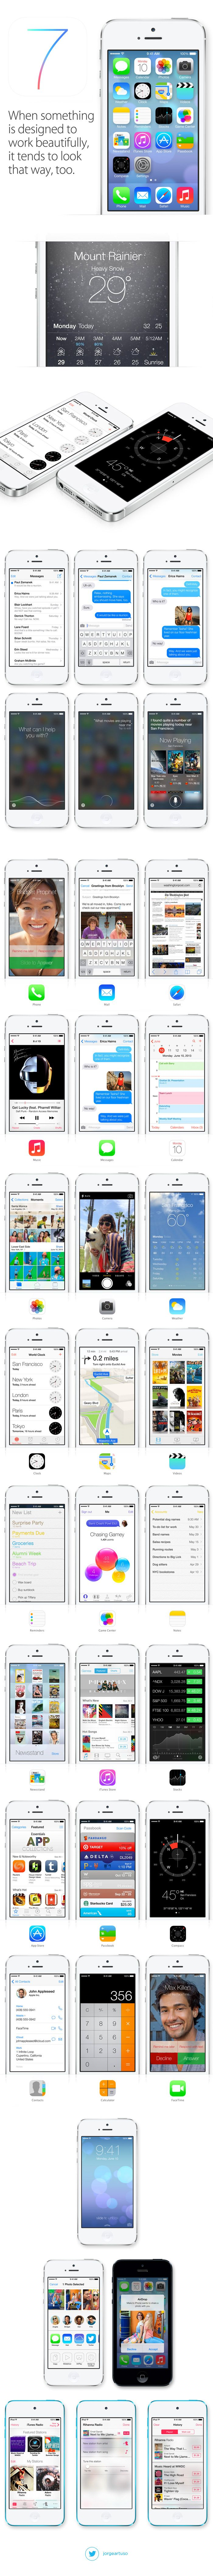 Apple iOS7 - new flat design